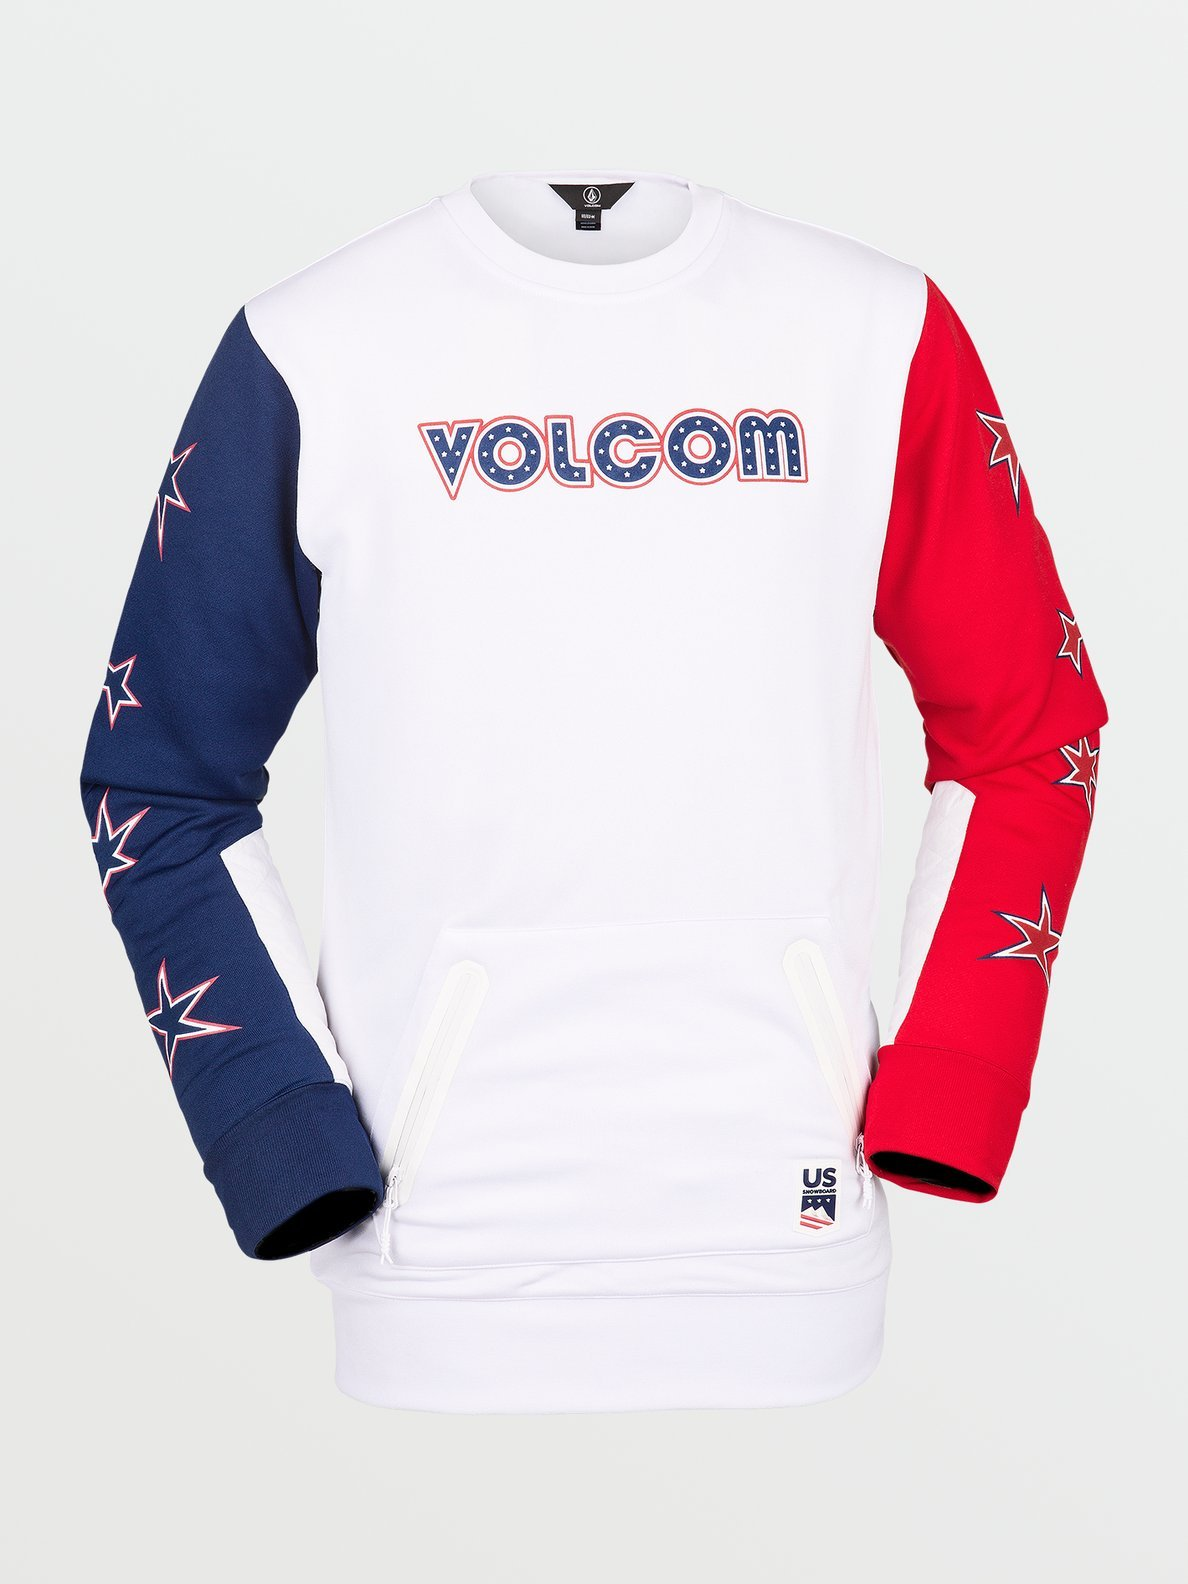 Volcom Let It Storm Fleece US Olympic Snowboard Team Edition